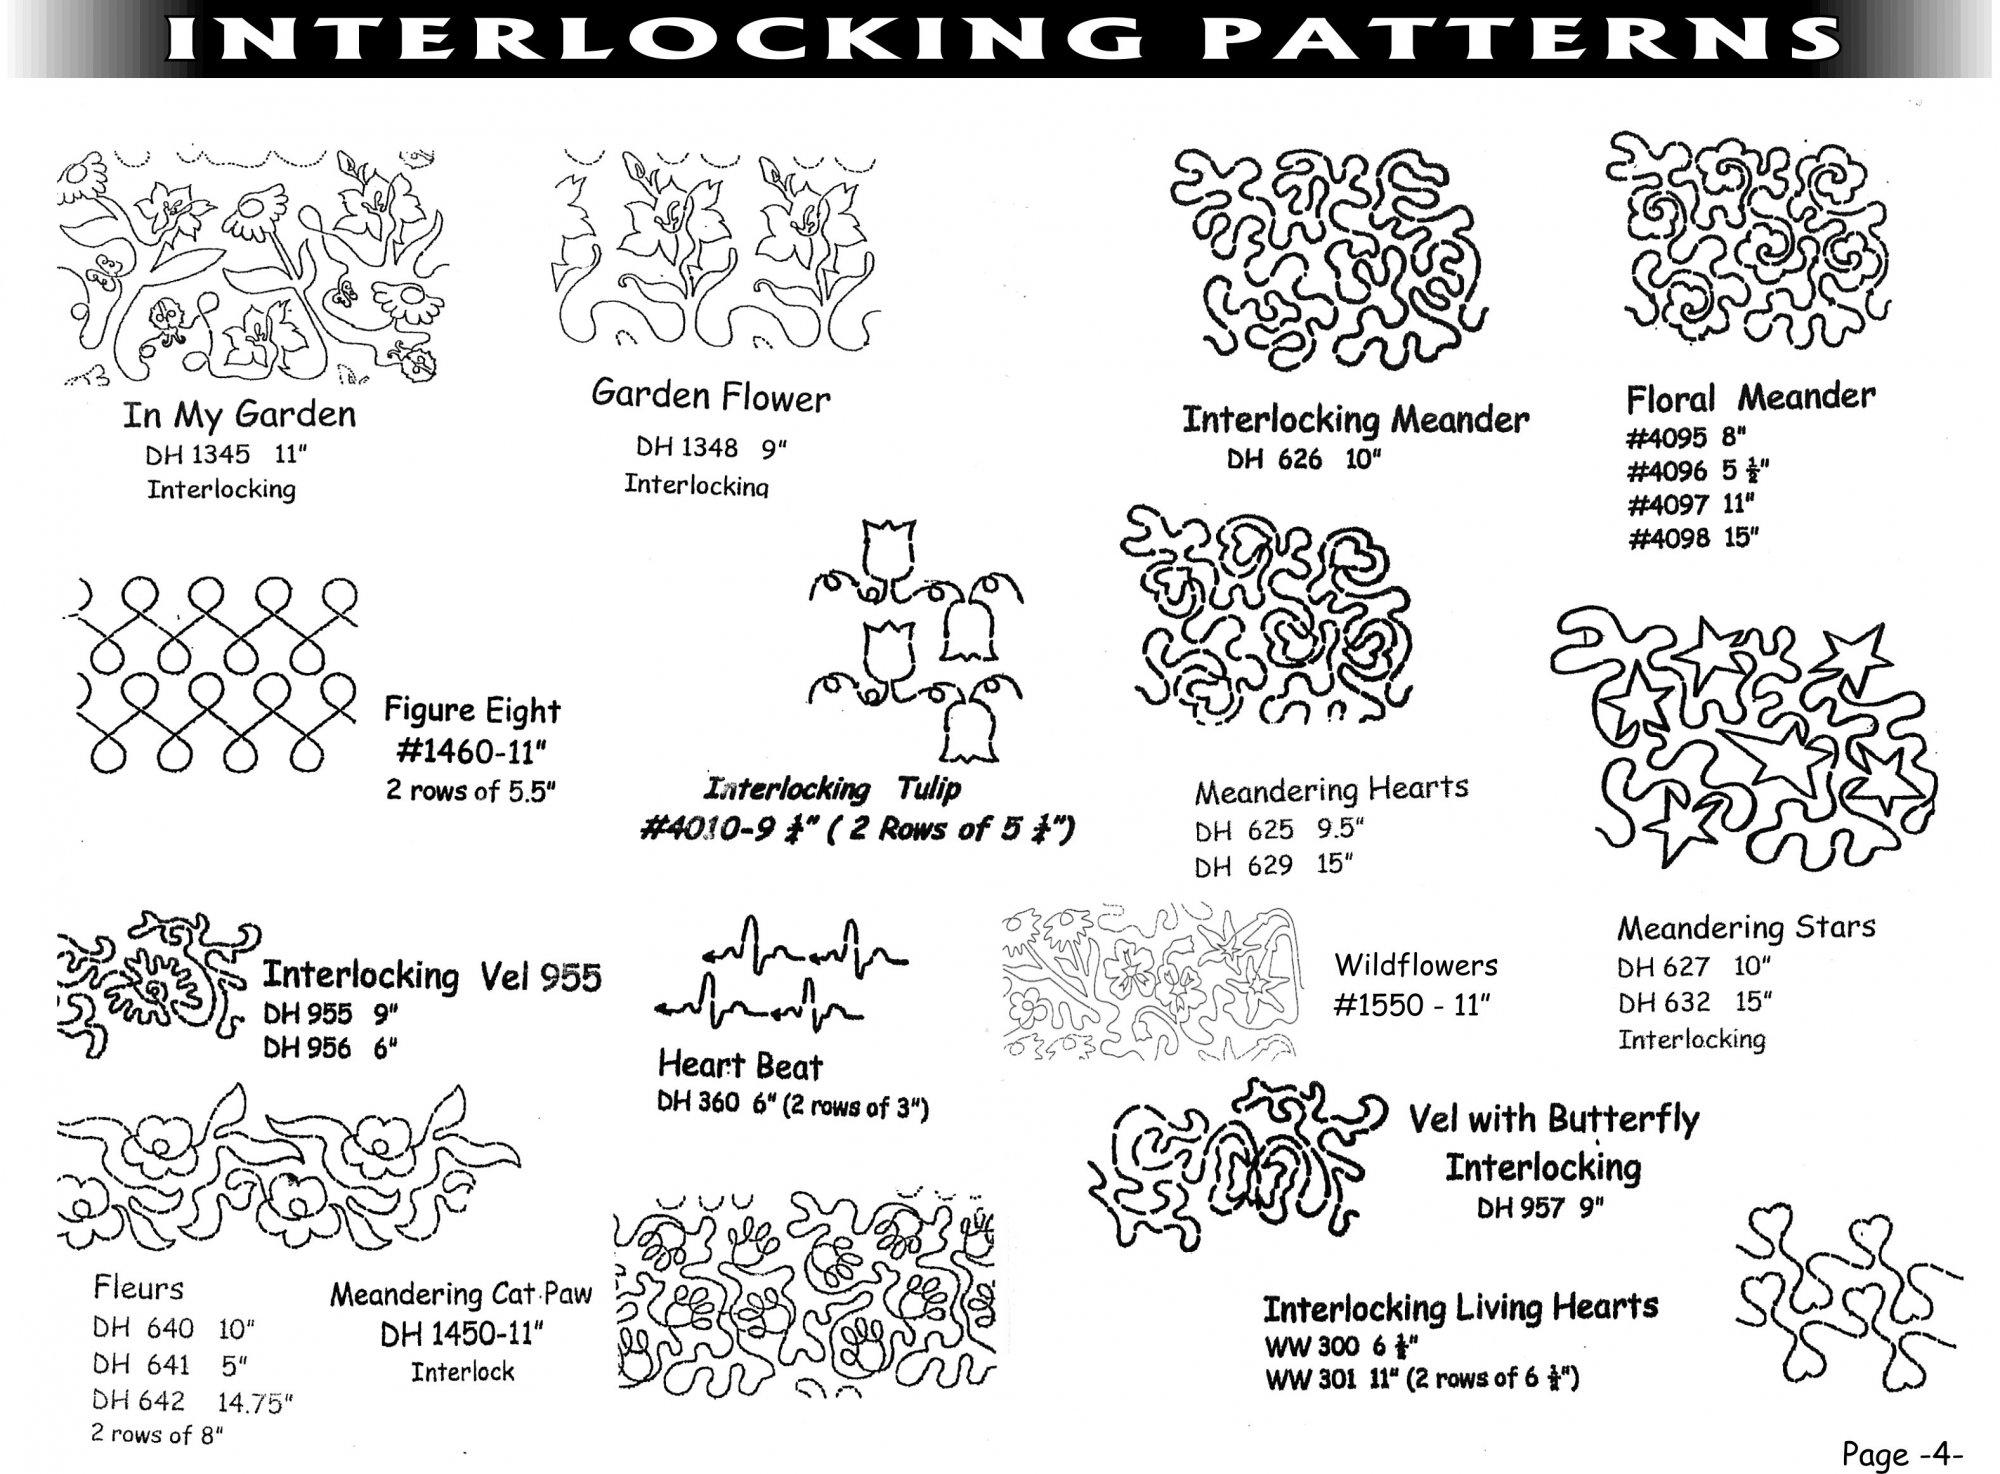 Pantographs-Interlocking Patterns-A- 6 1/2  - 6